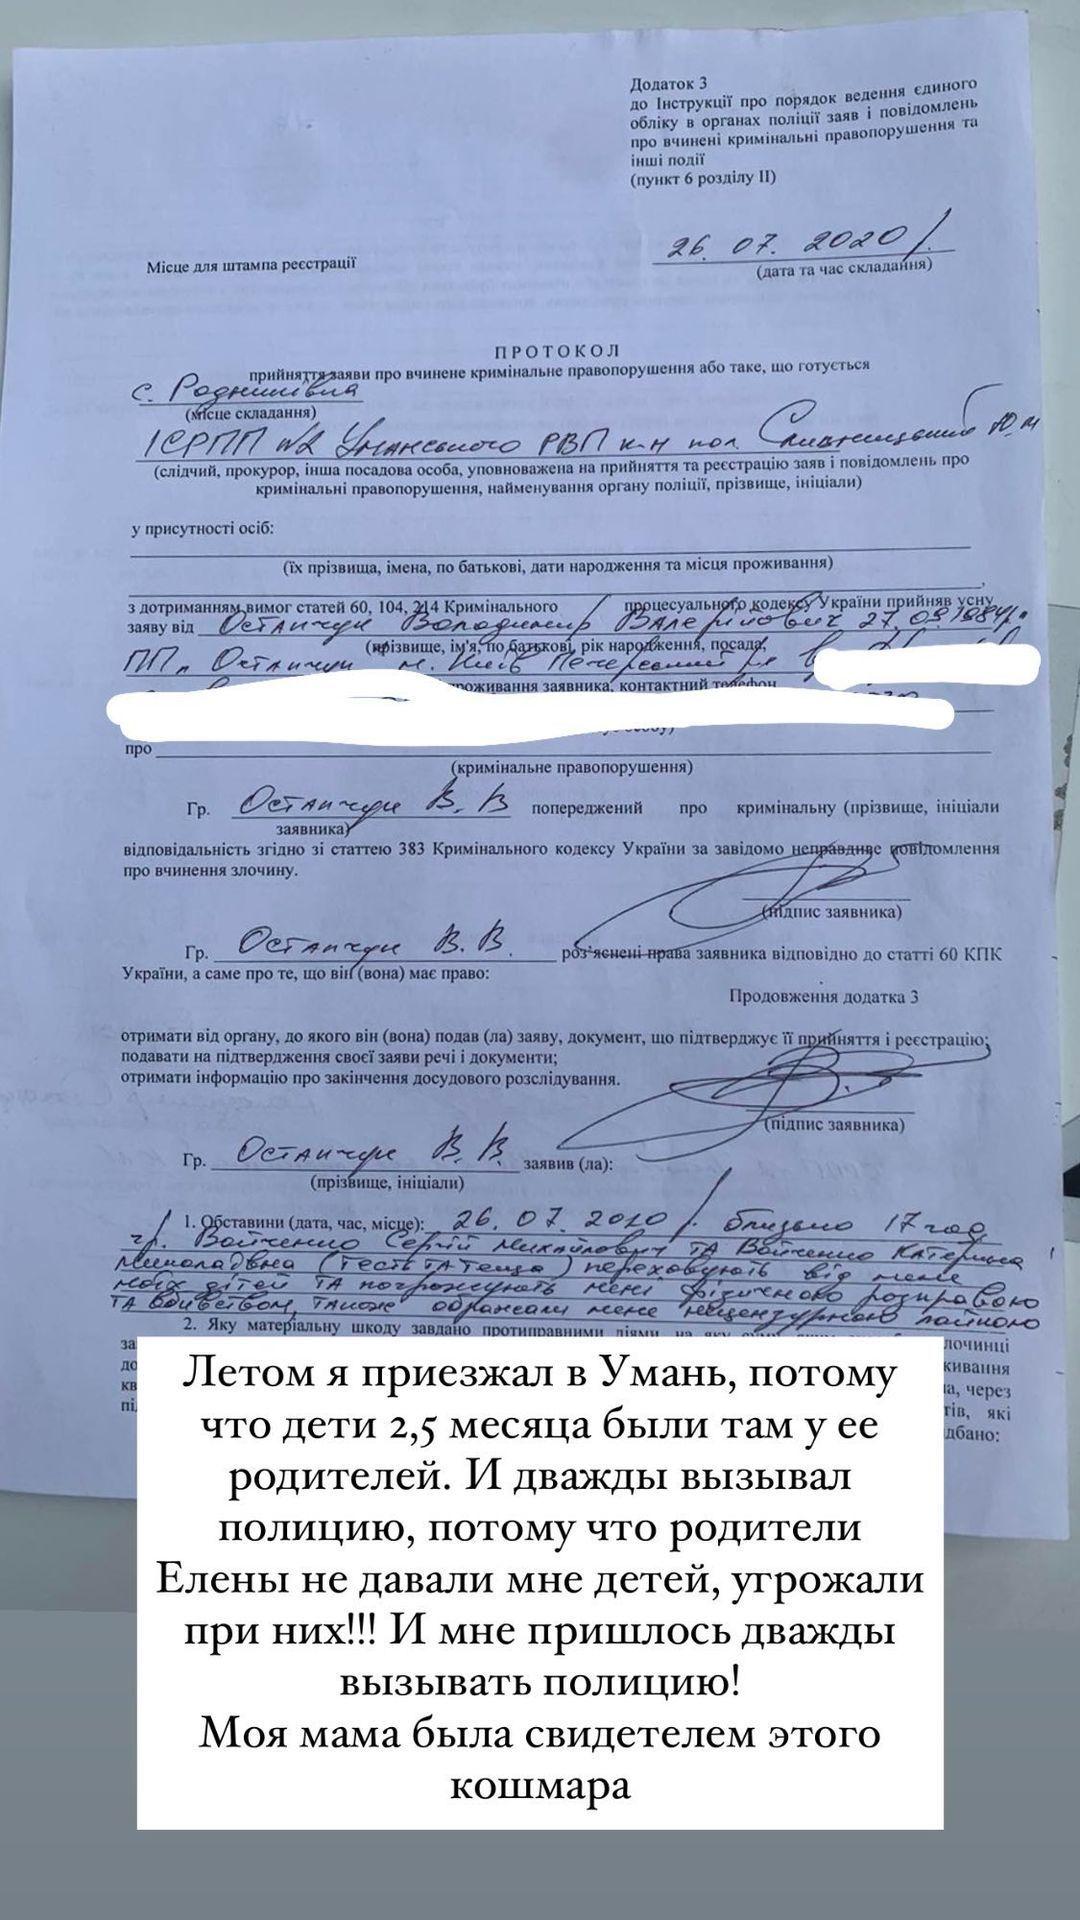 Володимир Остапчук_6